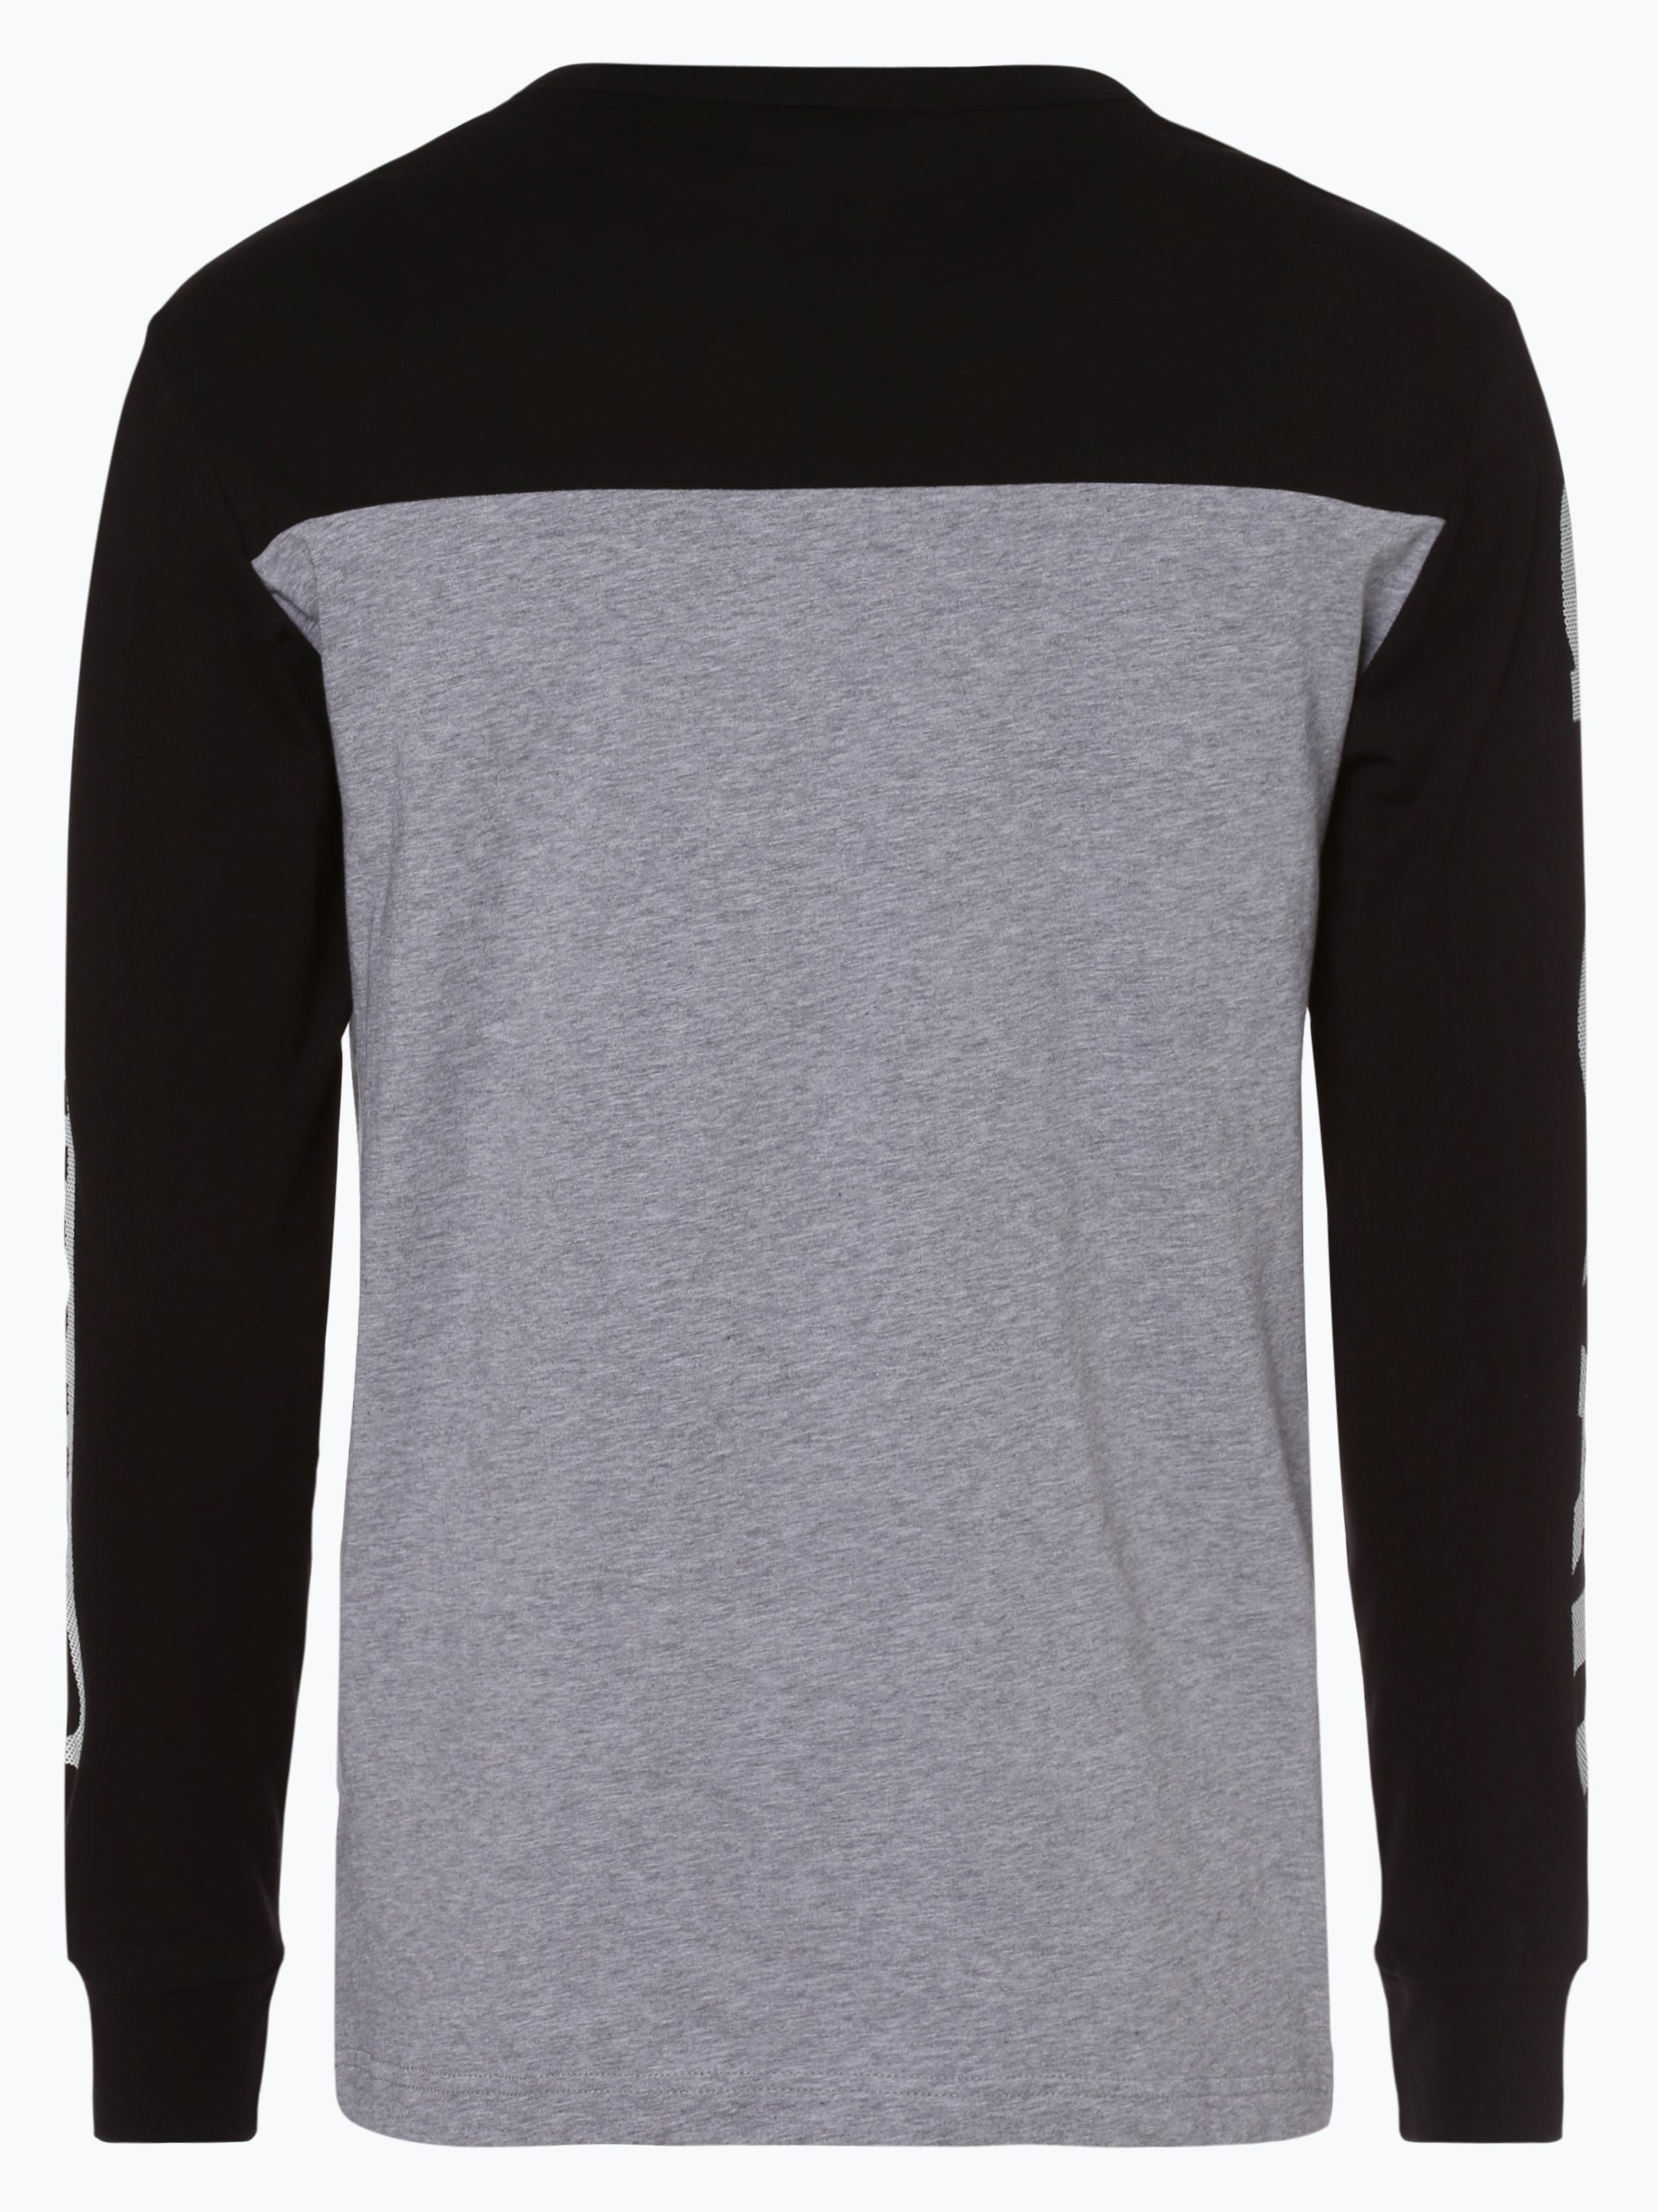 G-Star Męska koszulka z długim rękawem – Swando